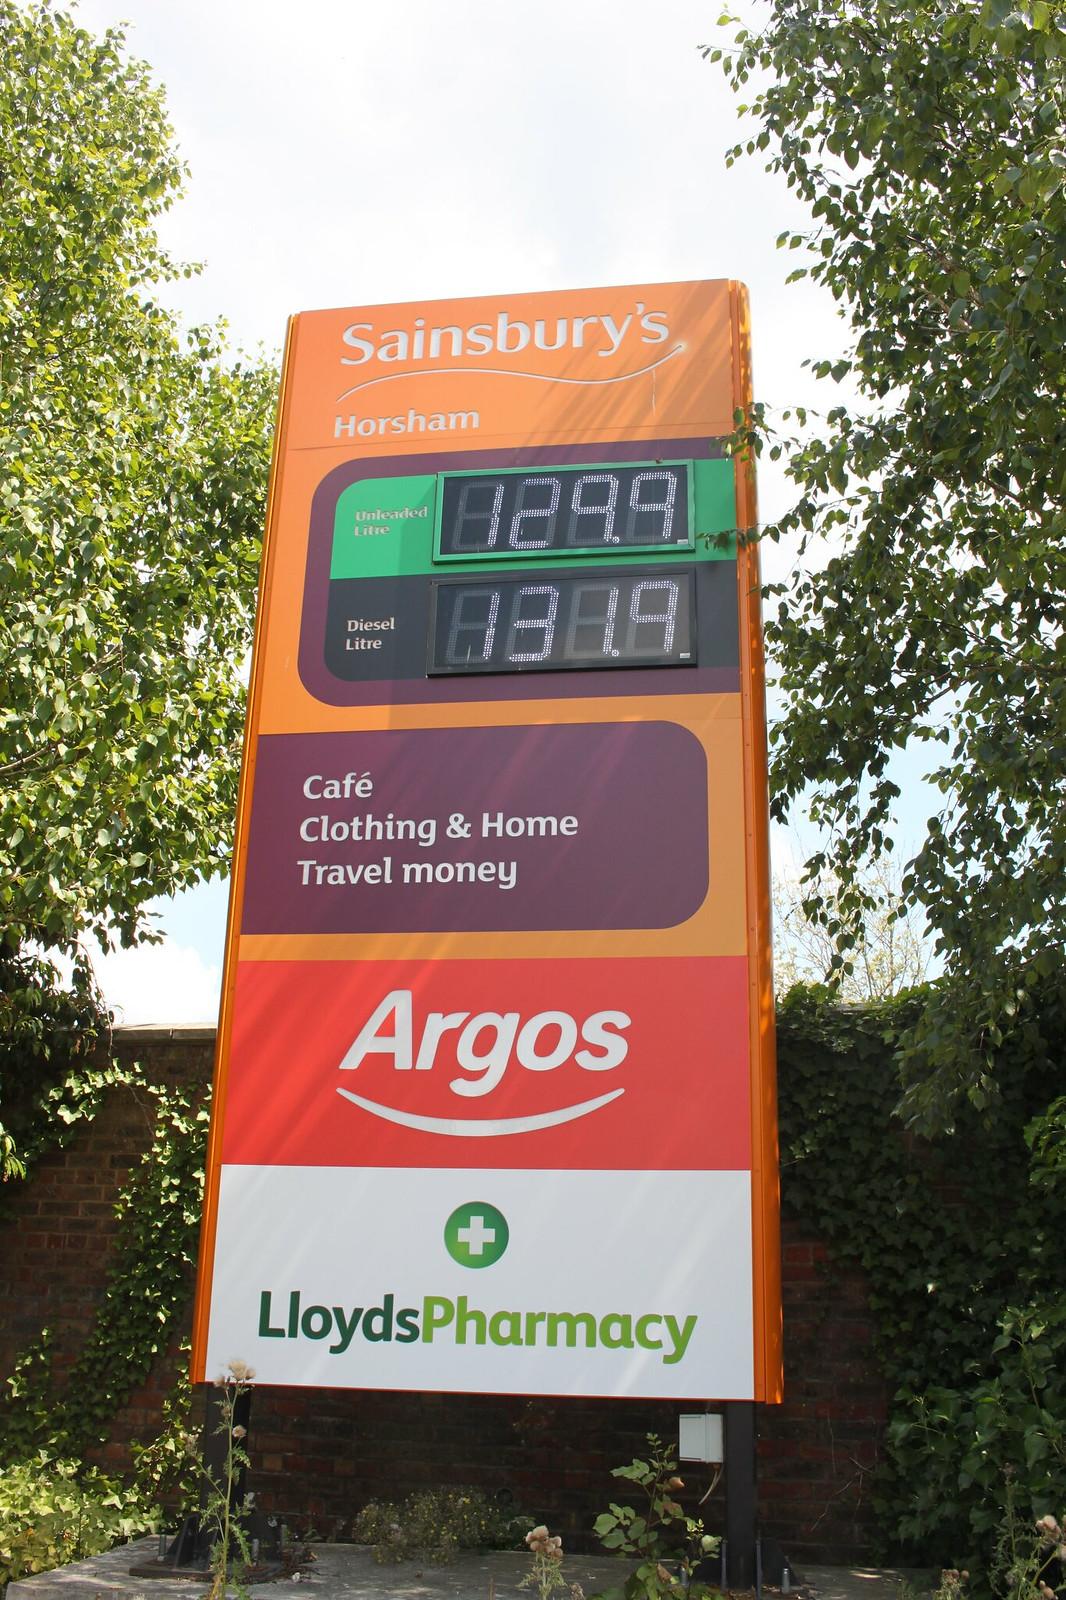 Argos in Sainsbury's Horsham